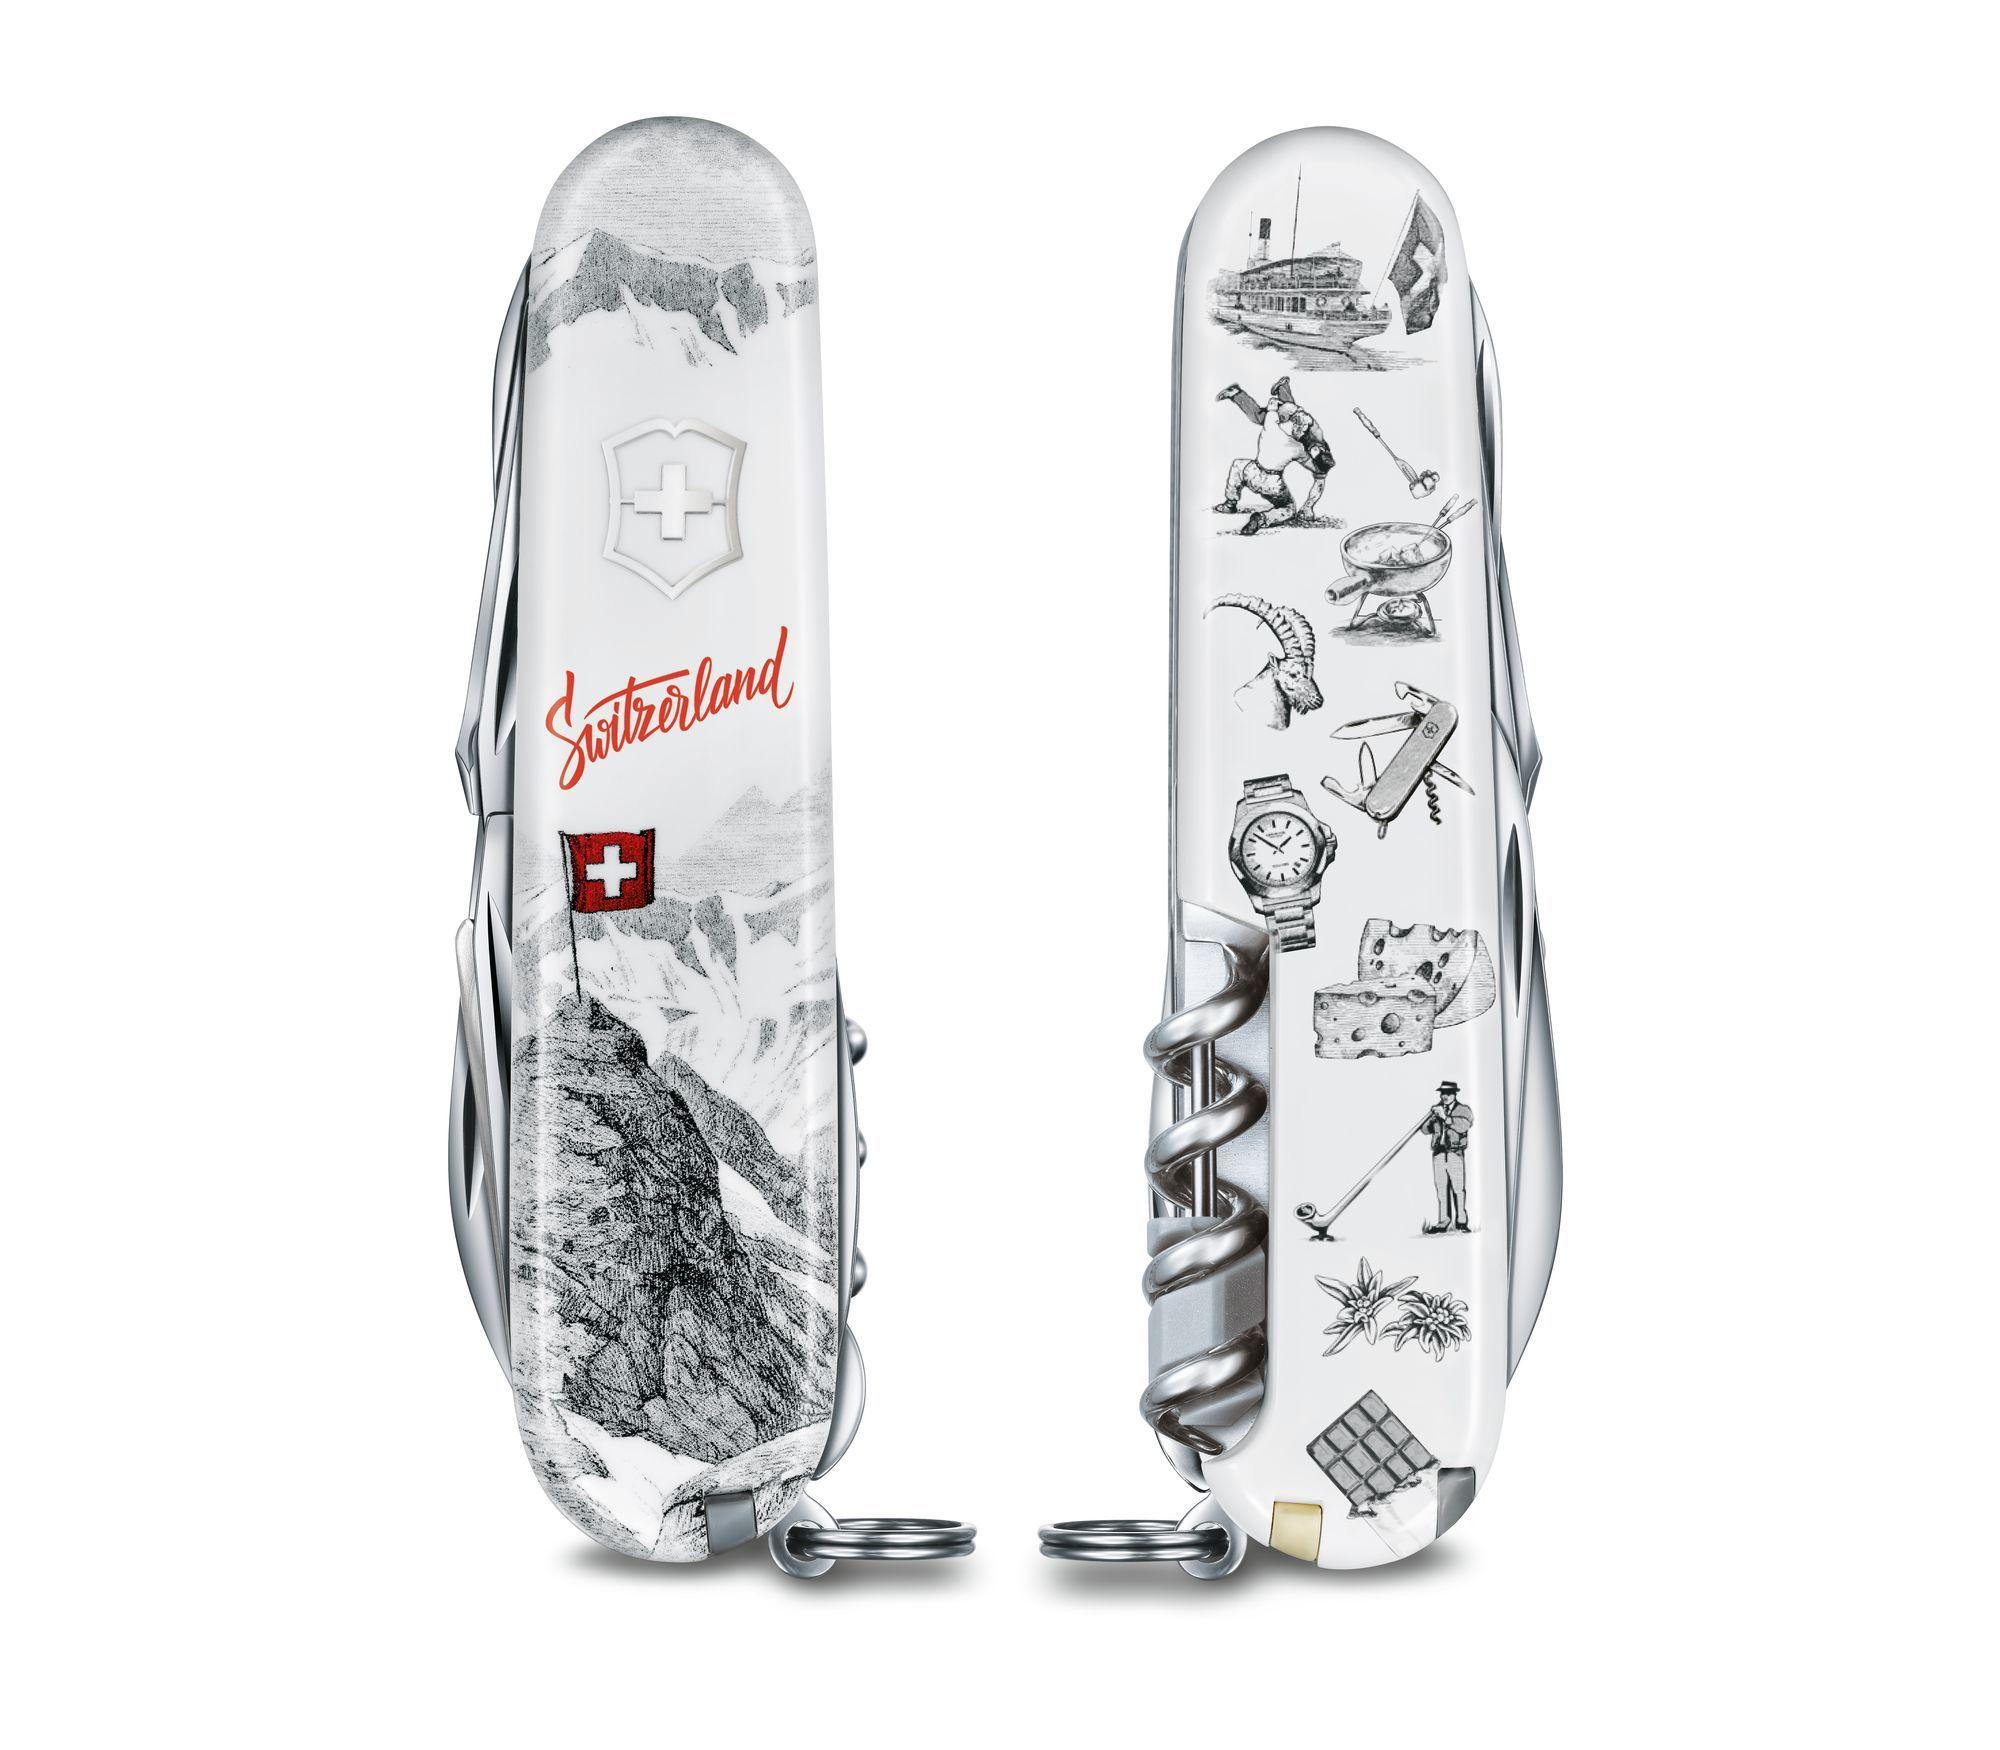 Складной коллекционный нож Victorinox Explorer Swiss Spirit Special Edition 2020 (1.6705.7L20) | Wenger-Victorinox.Ru